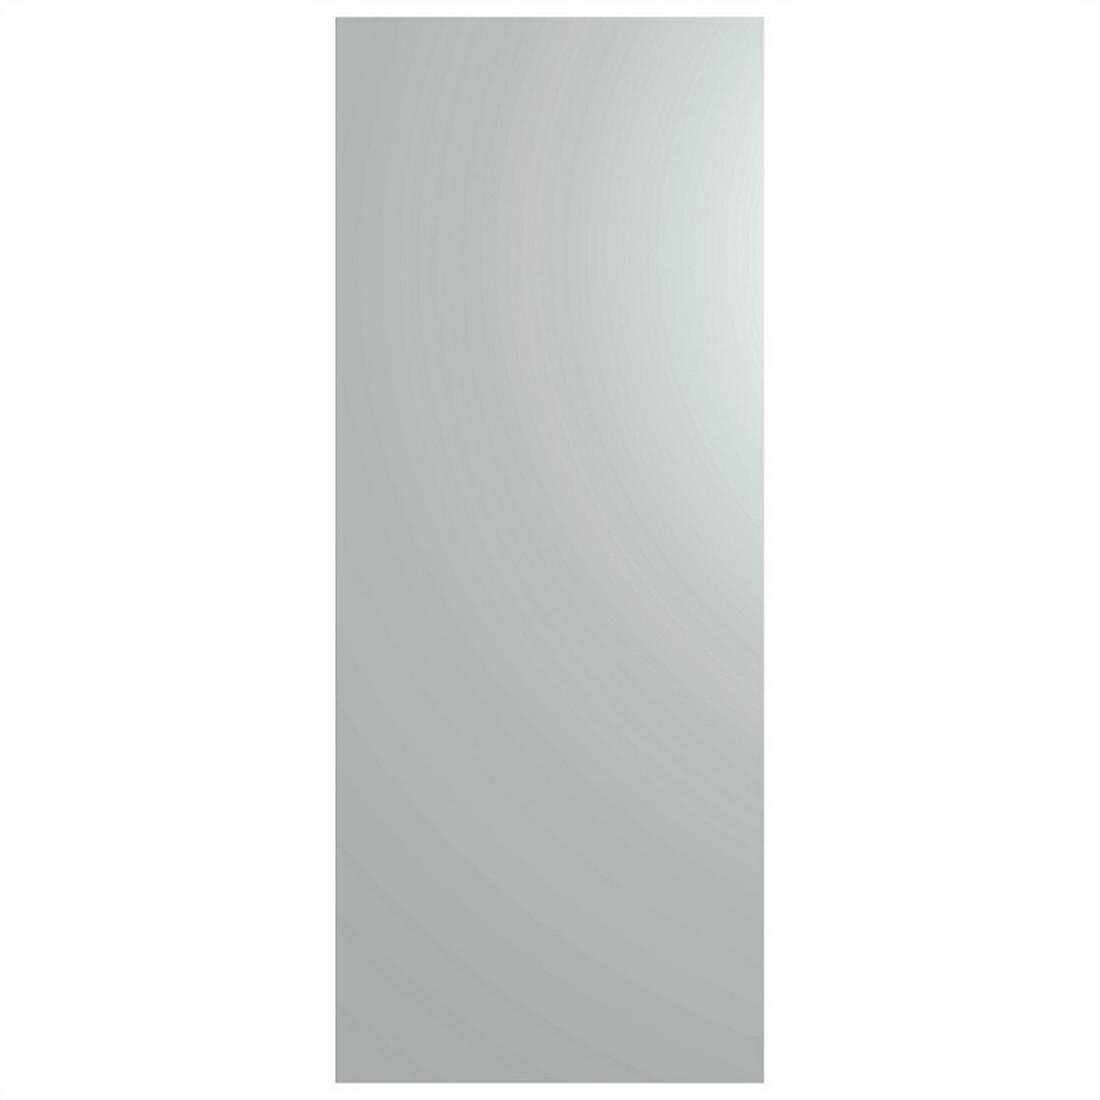 Doors Prime Coat Flush Interior Door 1980 x 610 x 35mm Honeycomb Core Pre-Primed MDF Skin PCM610